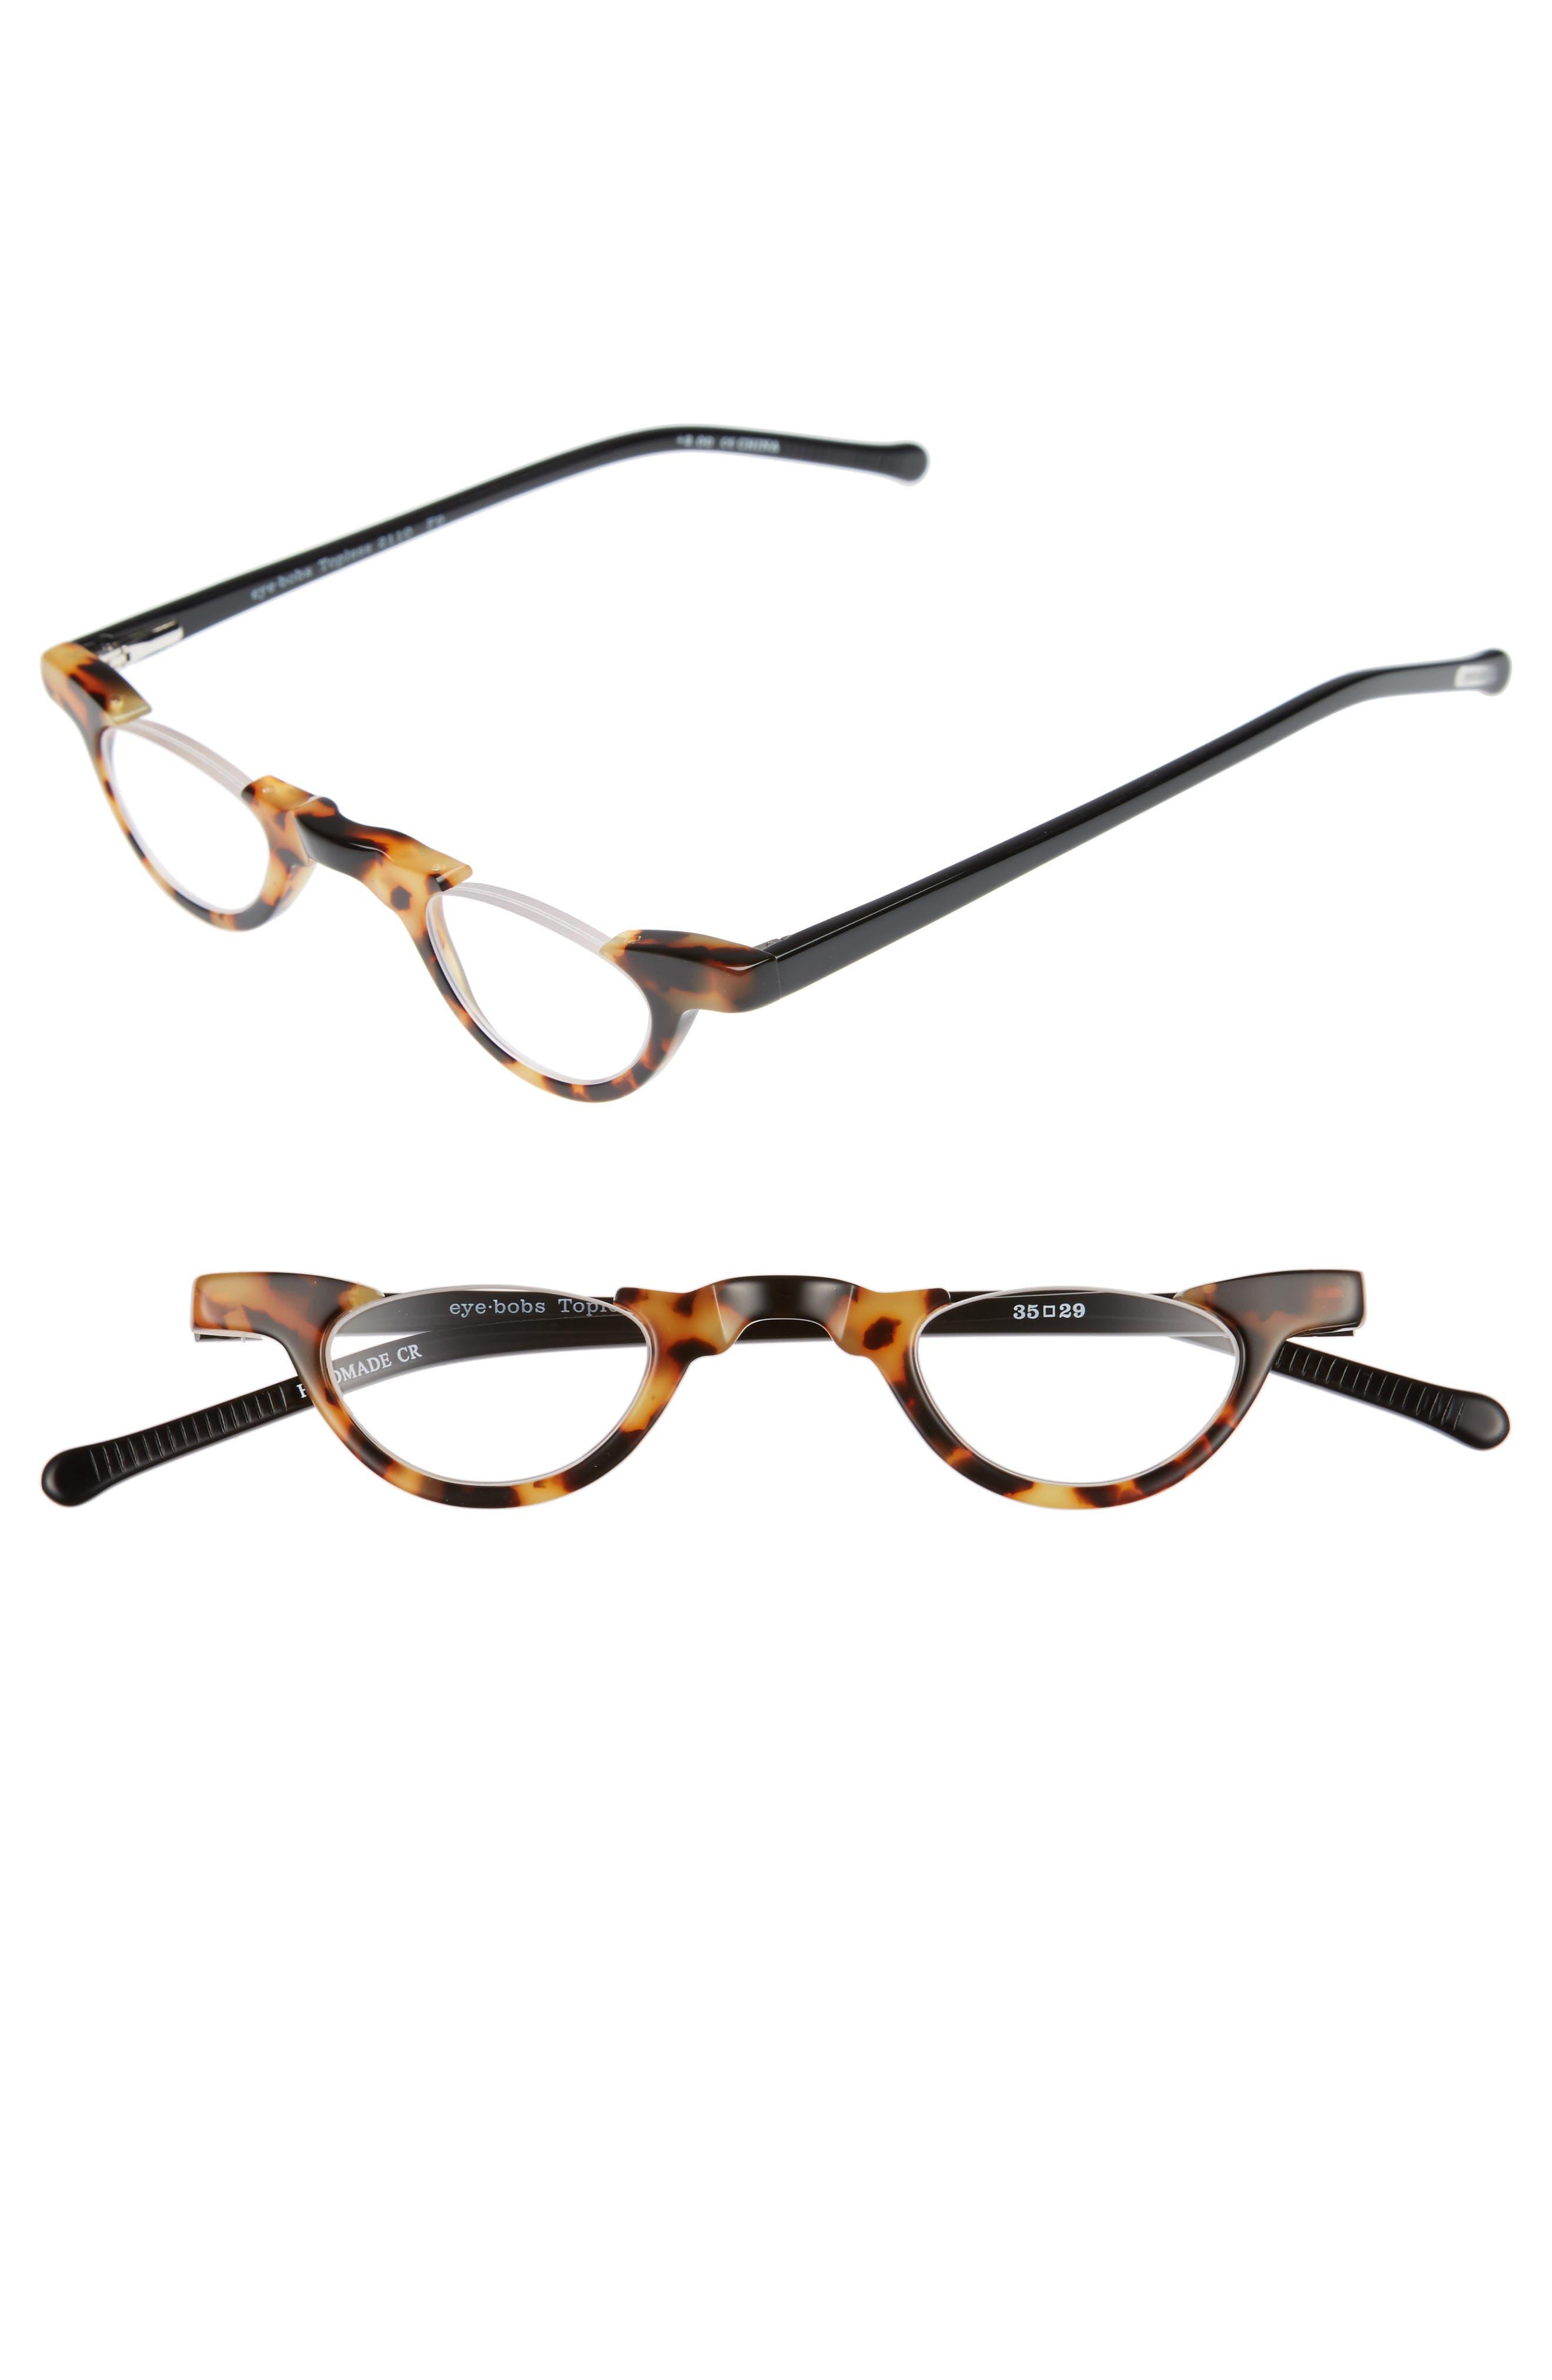 EYEBOBS Topless 35mm Reading Glasses